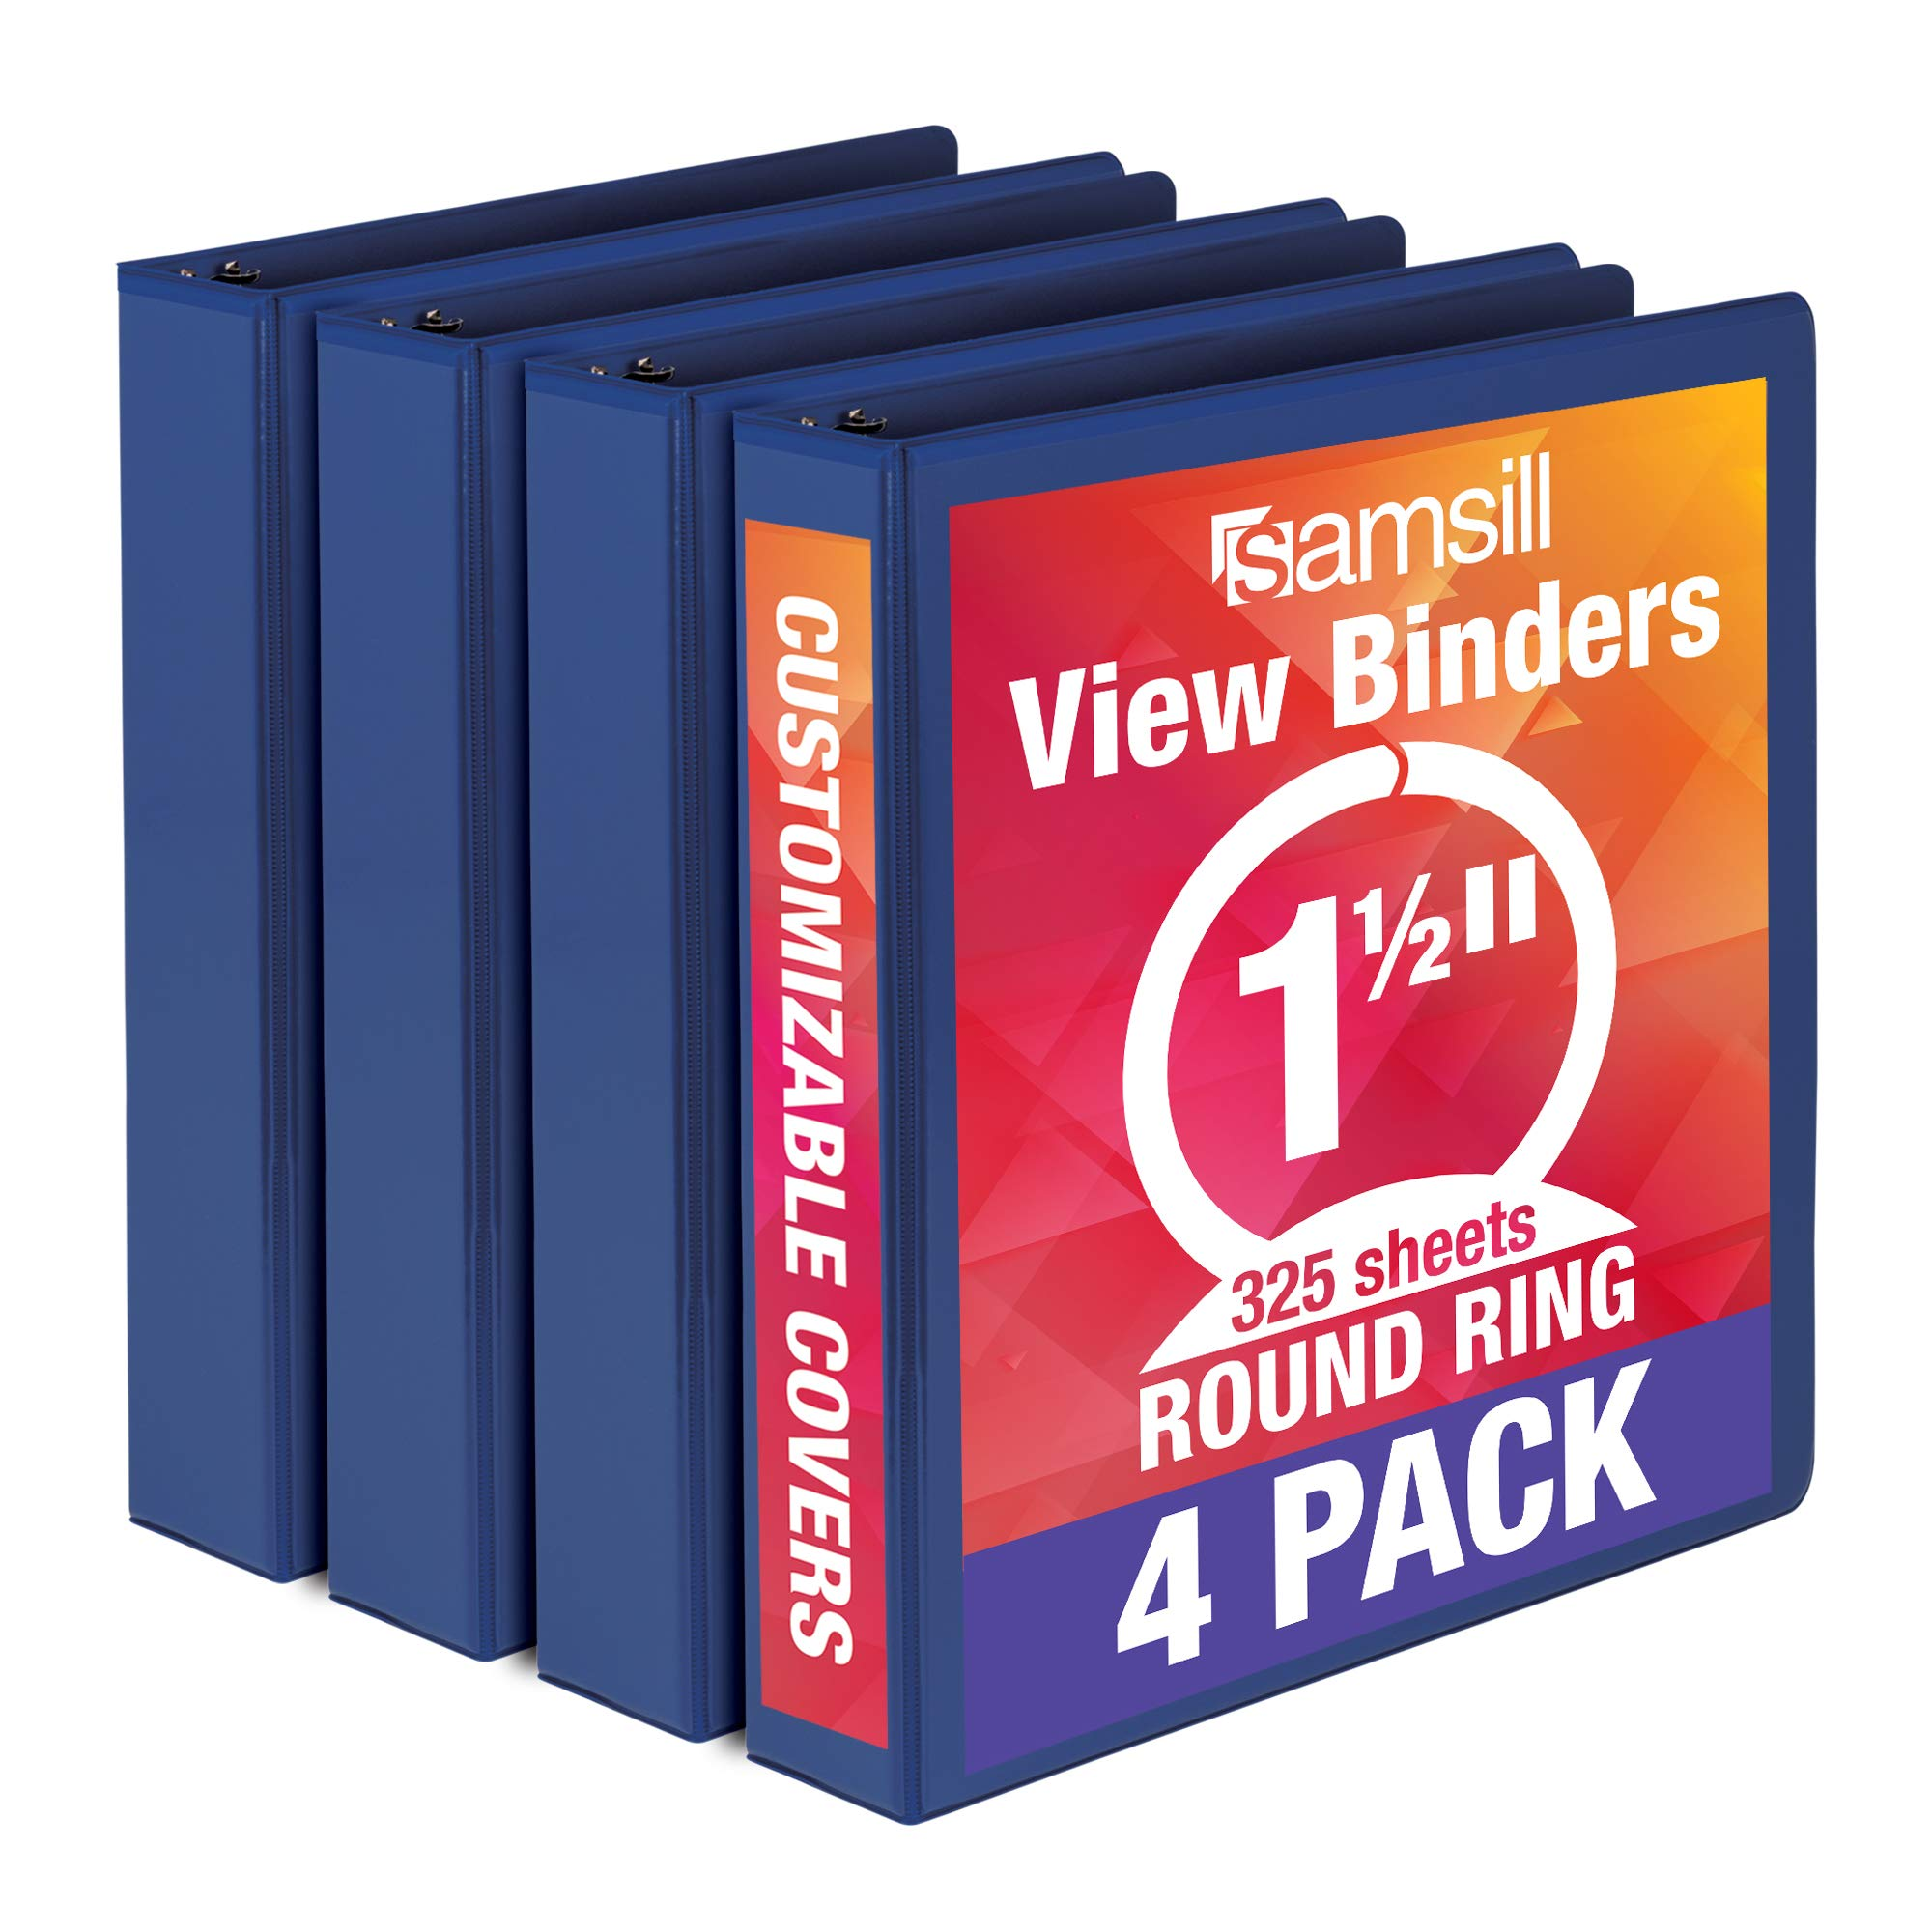 Samsill Economy 3 Ring Binder Organizer, 1.5 Inch Round Ring Binder, Customizable Clear View Cover, Blue Bulk Binder 4 Pack